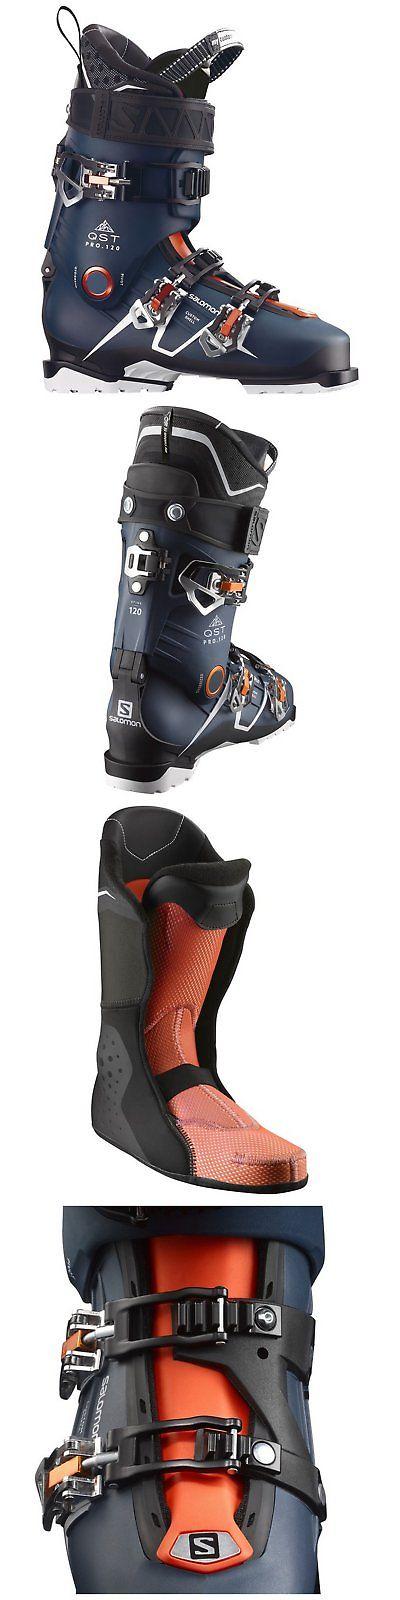 genuine shoes latest 100% genuine Men 16061: Salomon Qst Pro 120 Freeride Ski Boot - New 2017 ...